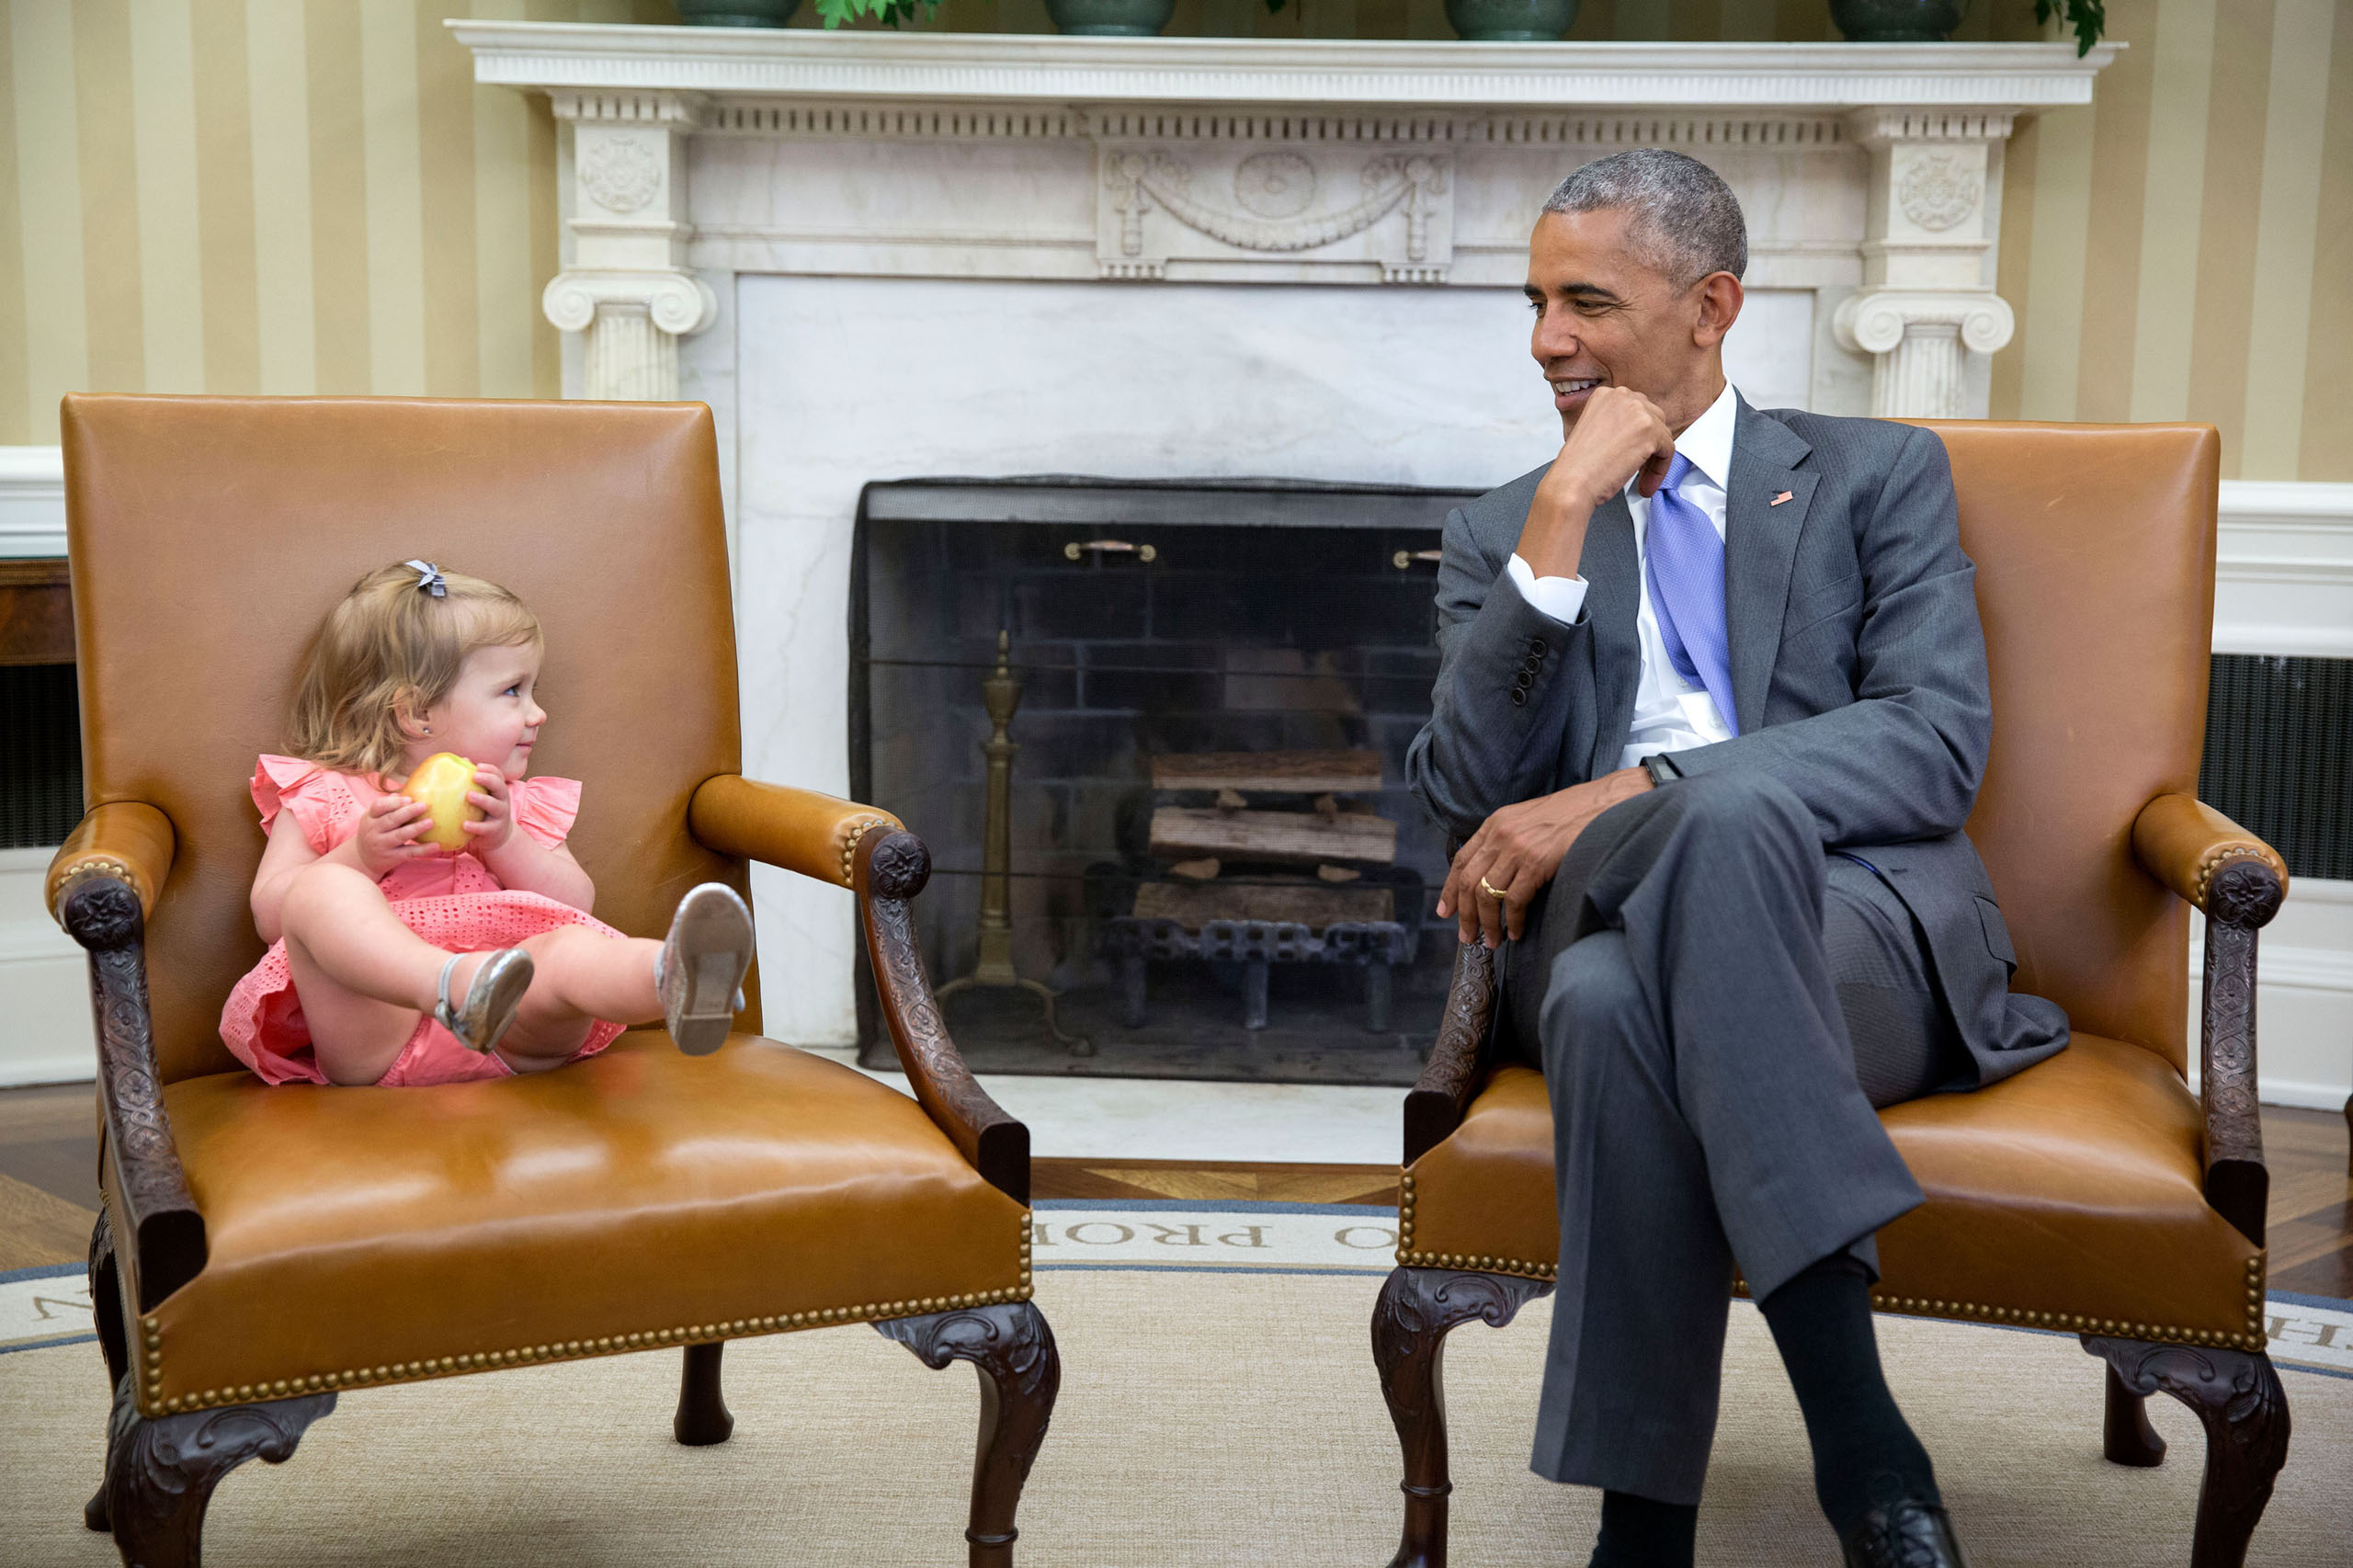 President Barack Obama visits with former adviser David Axelrod's granddaughter, Maelin, in the Oval Office, on June 22, 2016.